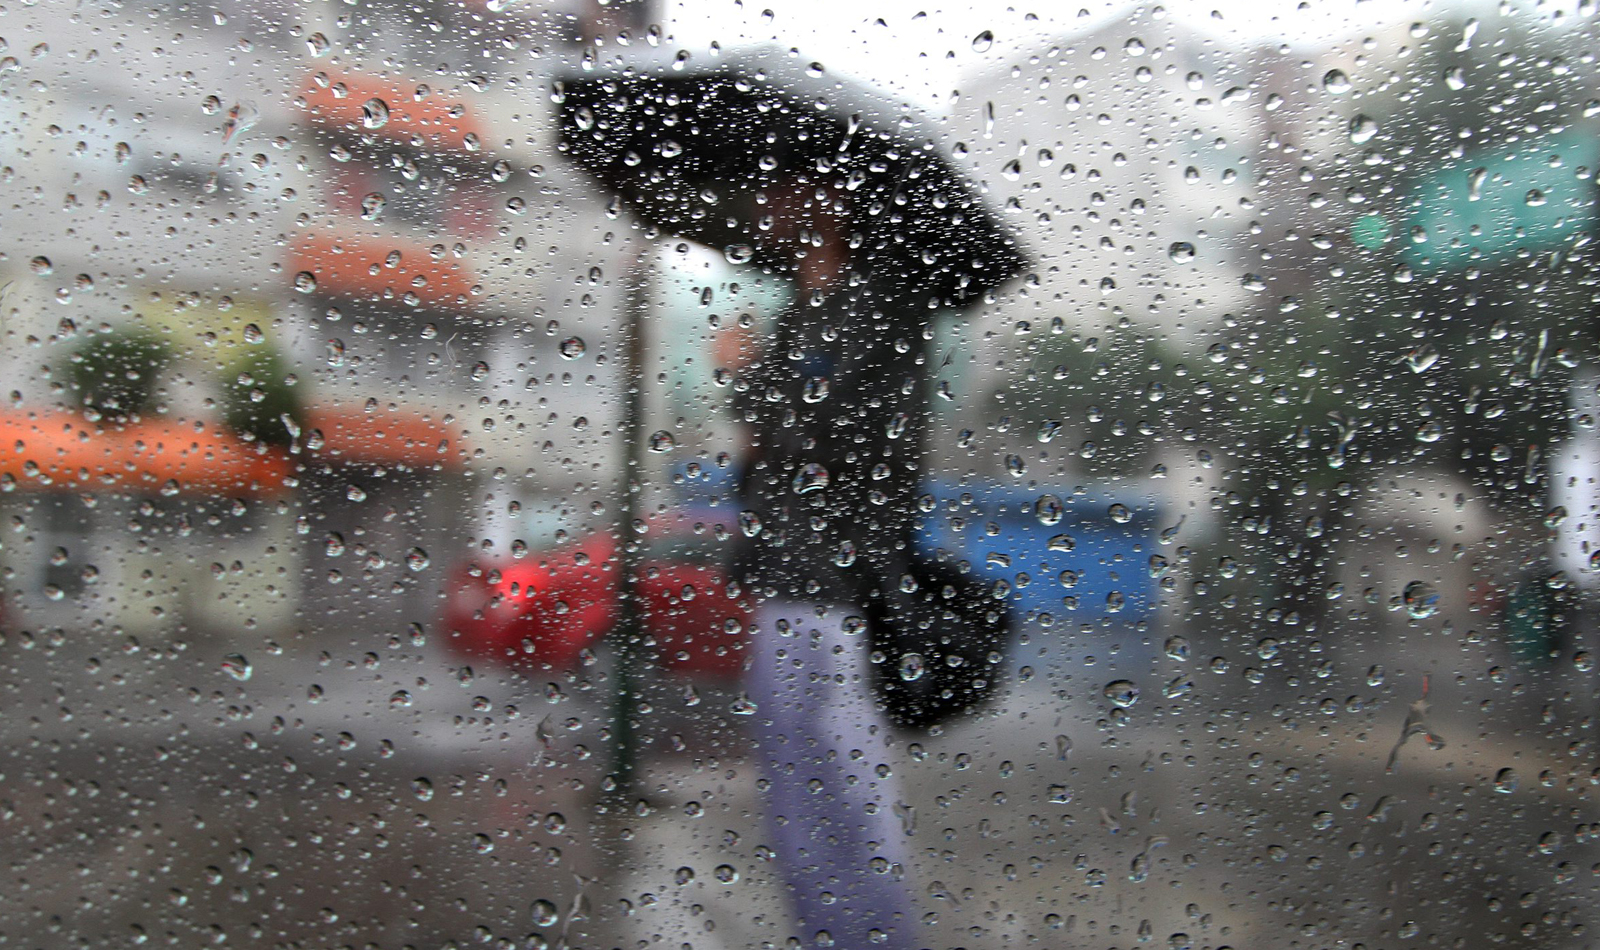 Este lunes se prevén lluvias fuertes al Sur de la Metrópoli